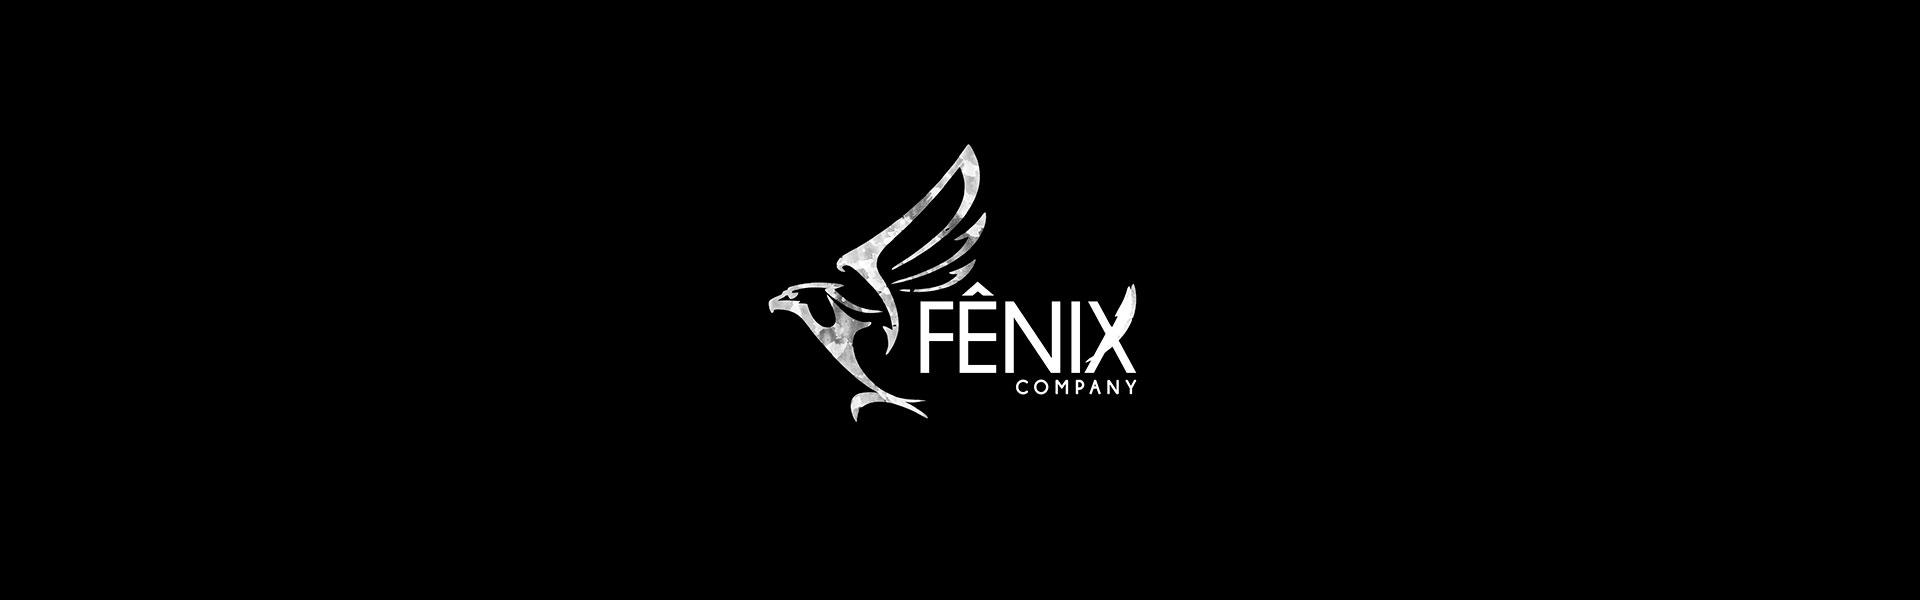 FENIX FILMES